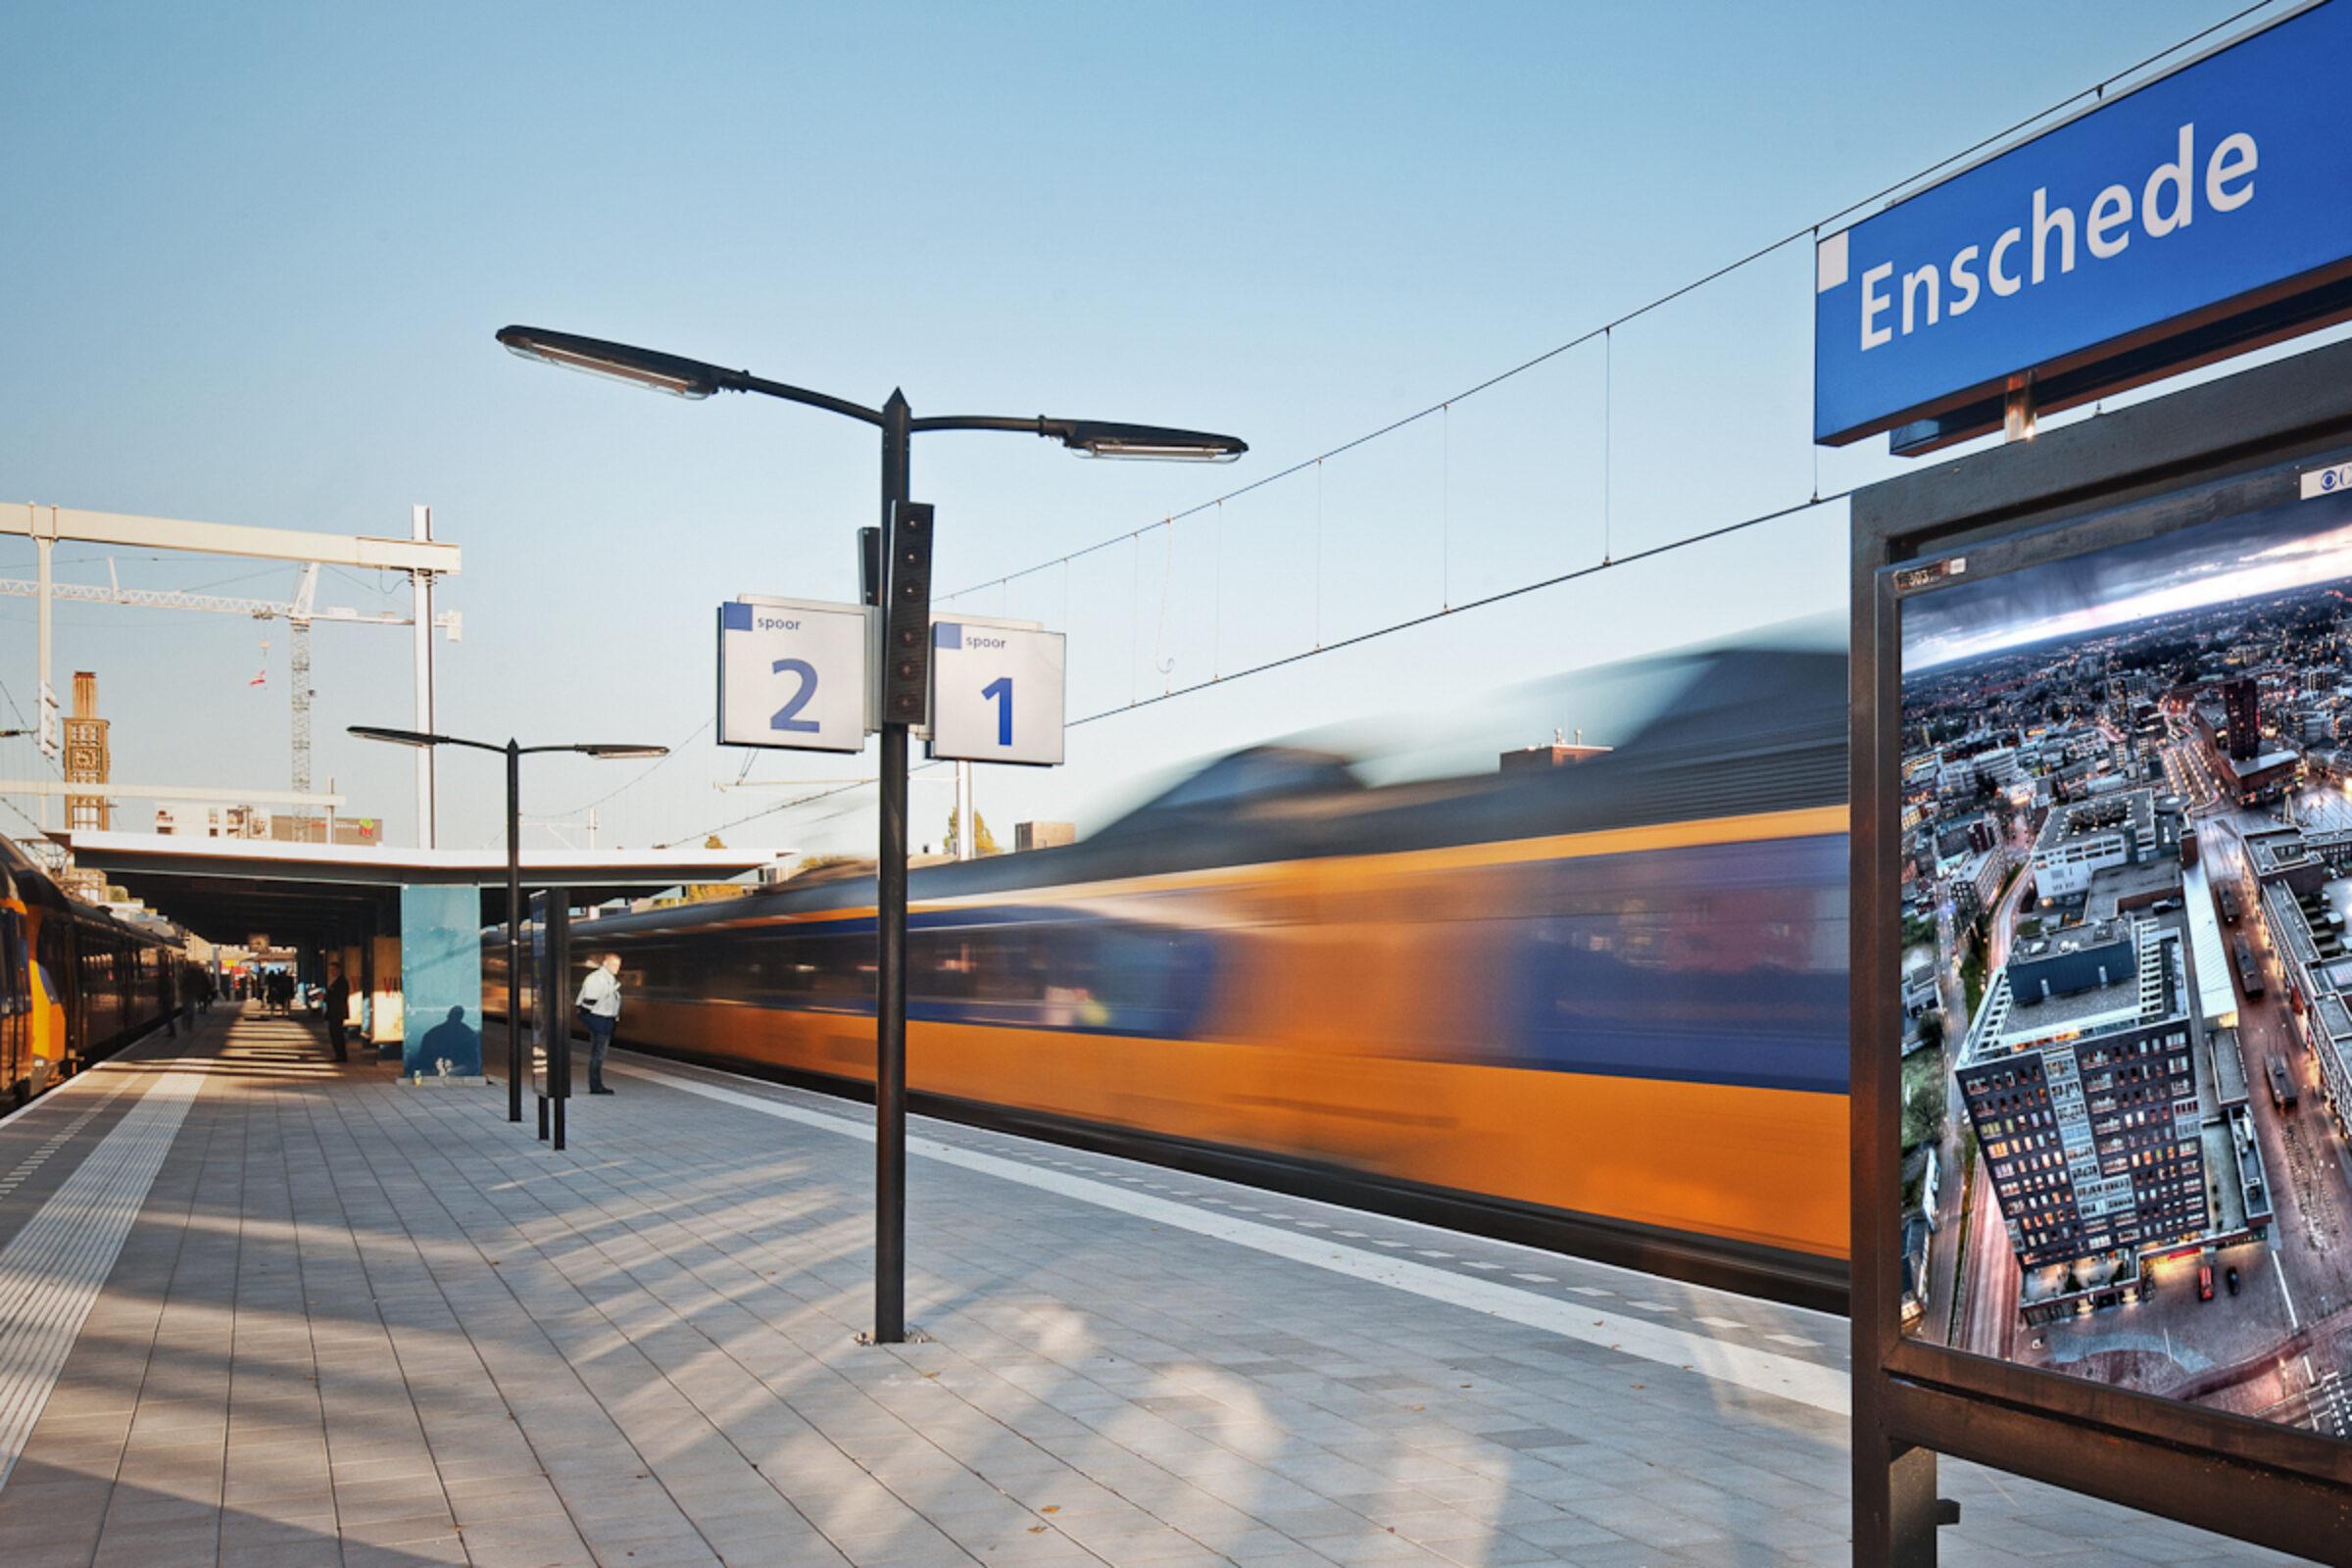 Bahnhof Enschede